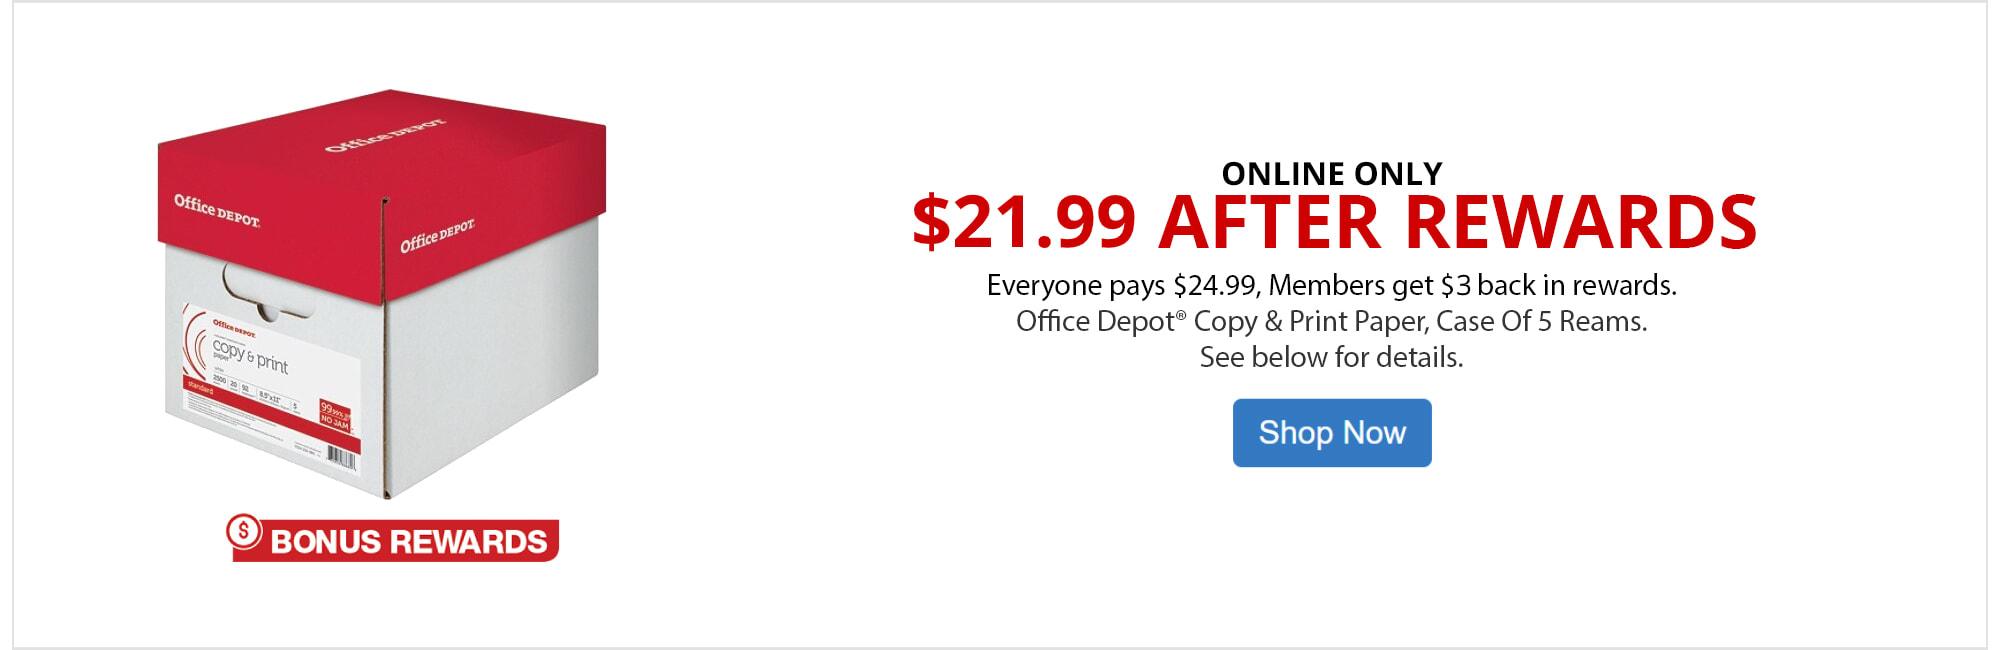 $21.99 After Rewards Office Depot® Copy & Print Paper